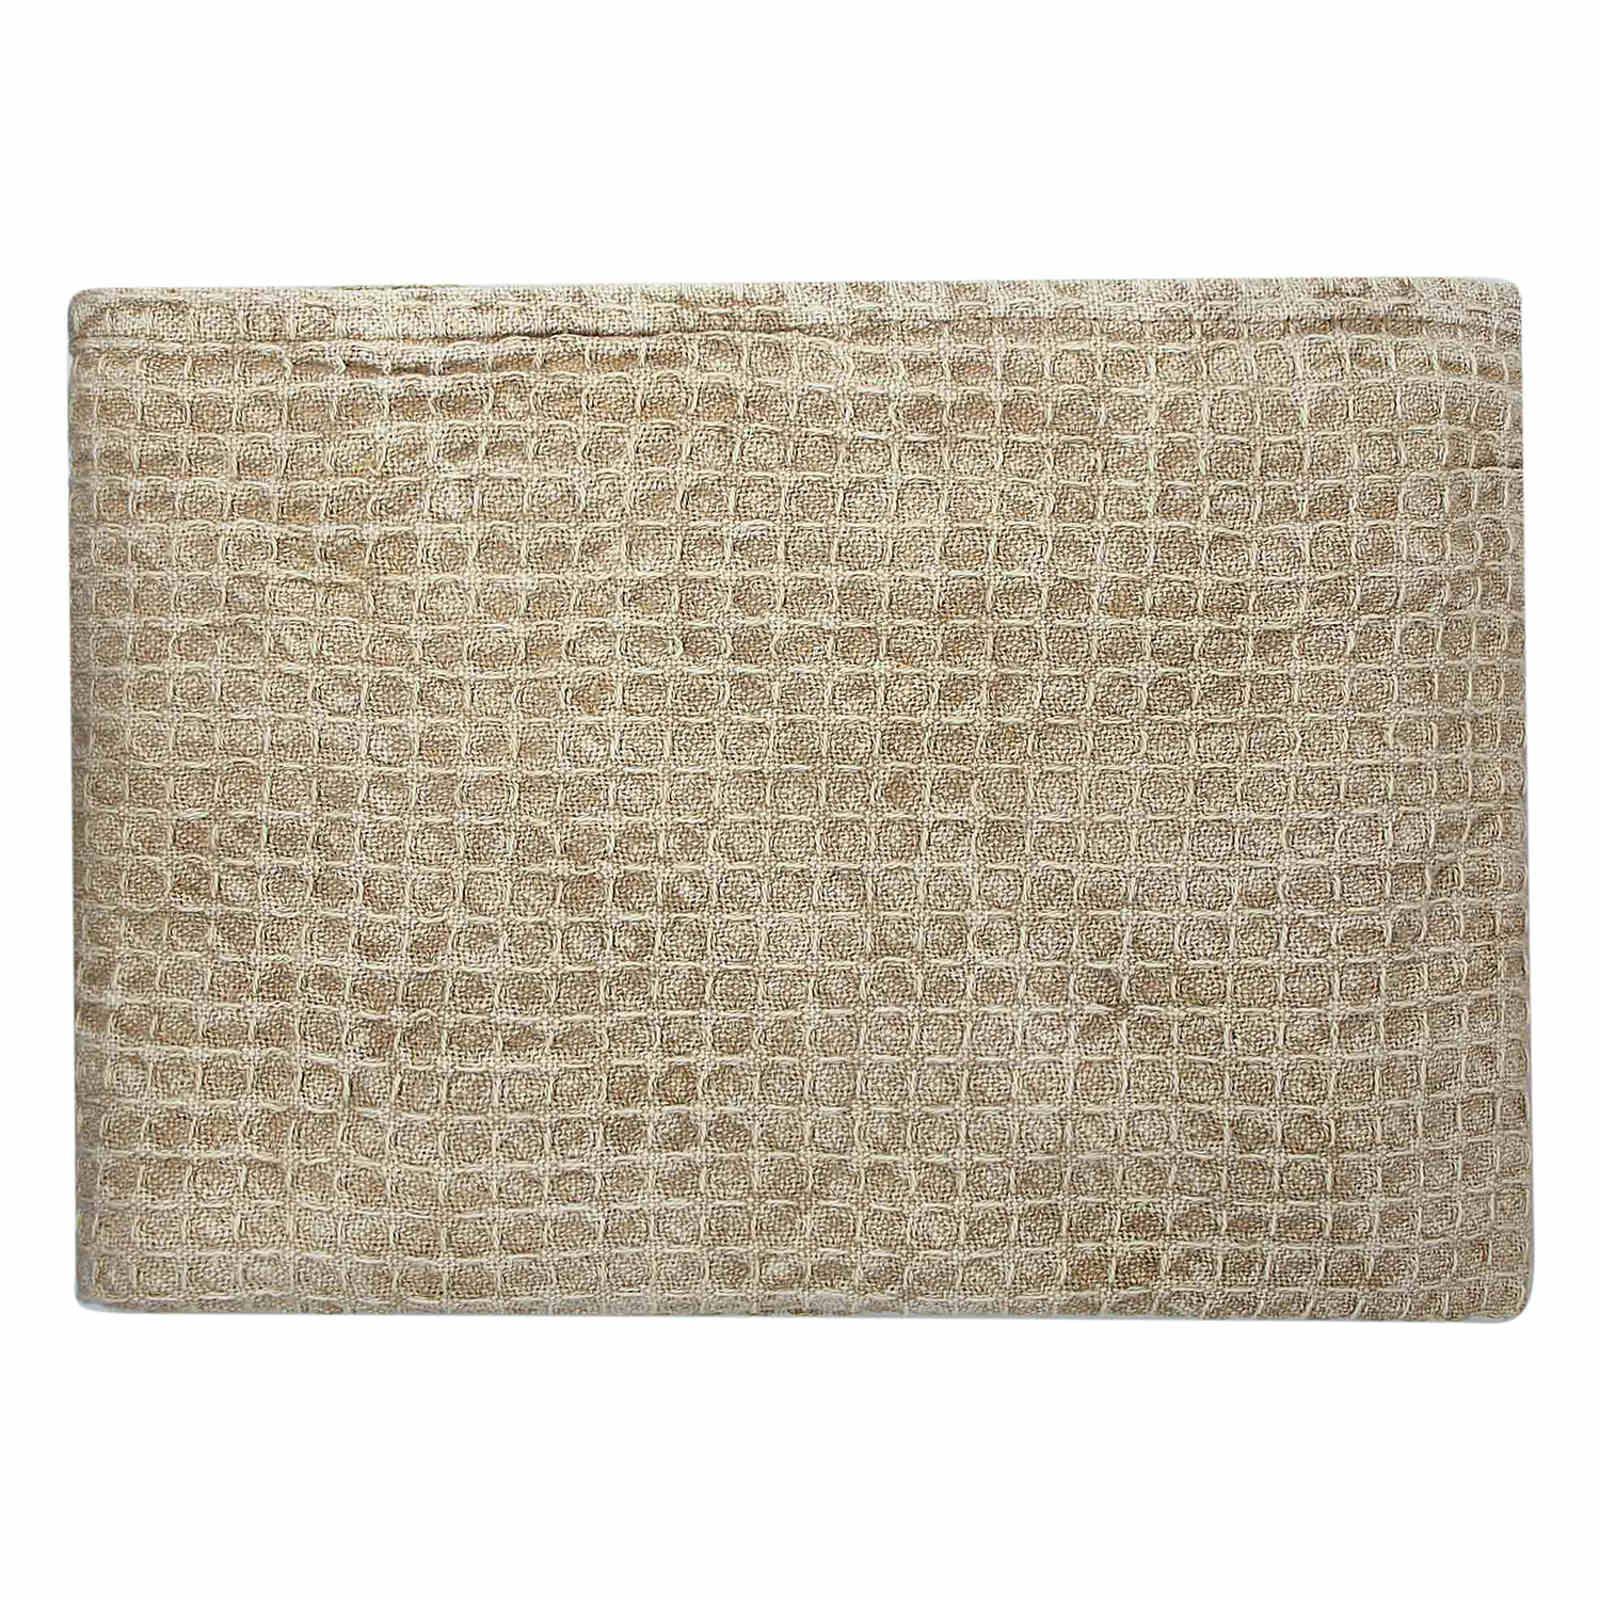 Oregon-Stonewash-Waffle-Throw-Modern-Distressed-Sofa-Bed-Blankets-100-Cotton thumbnail 9